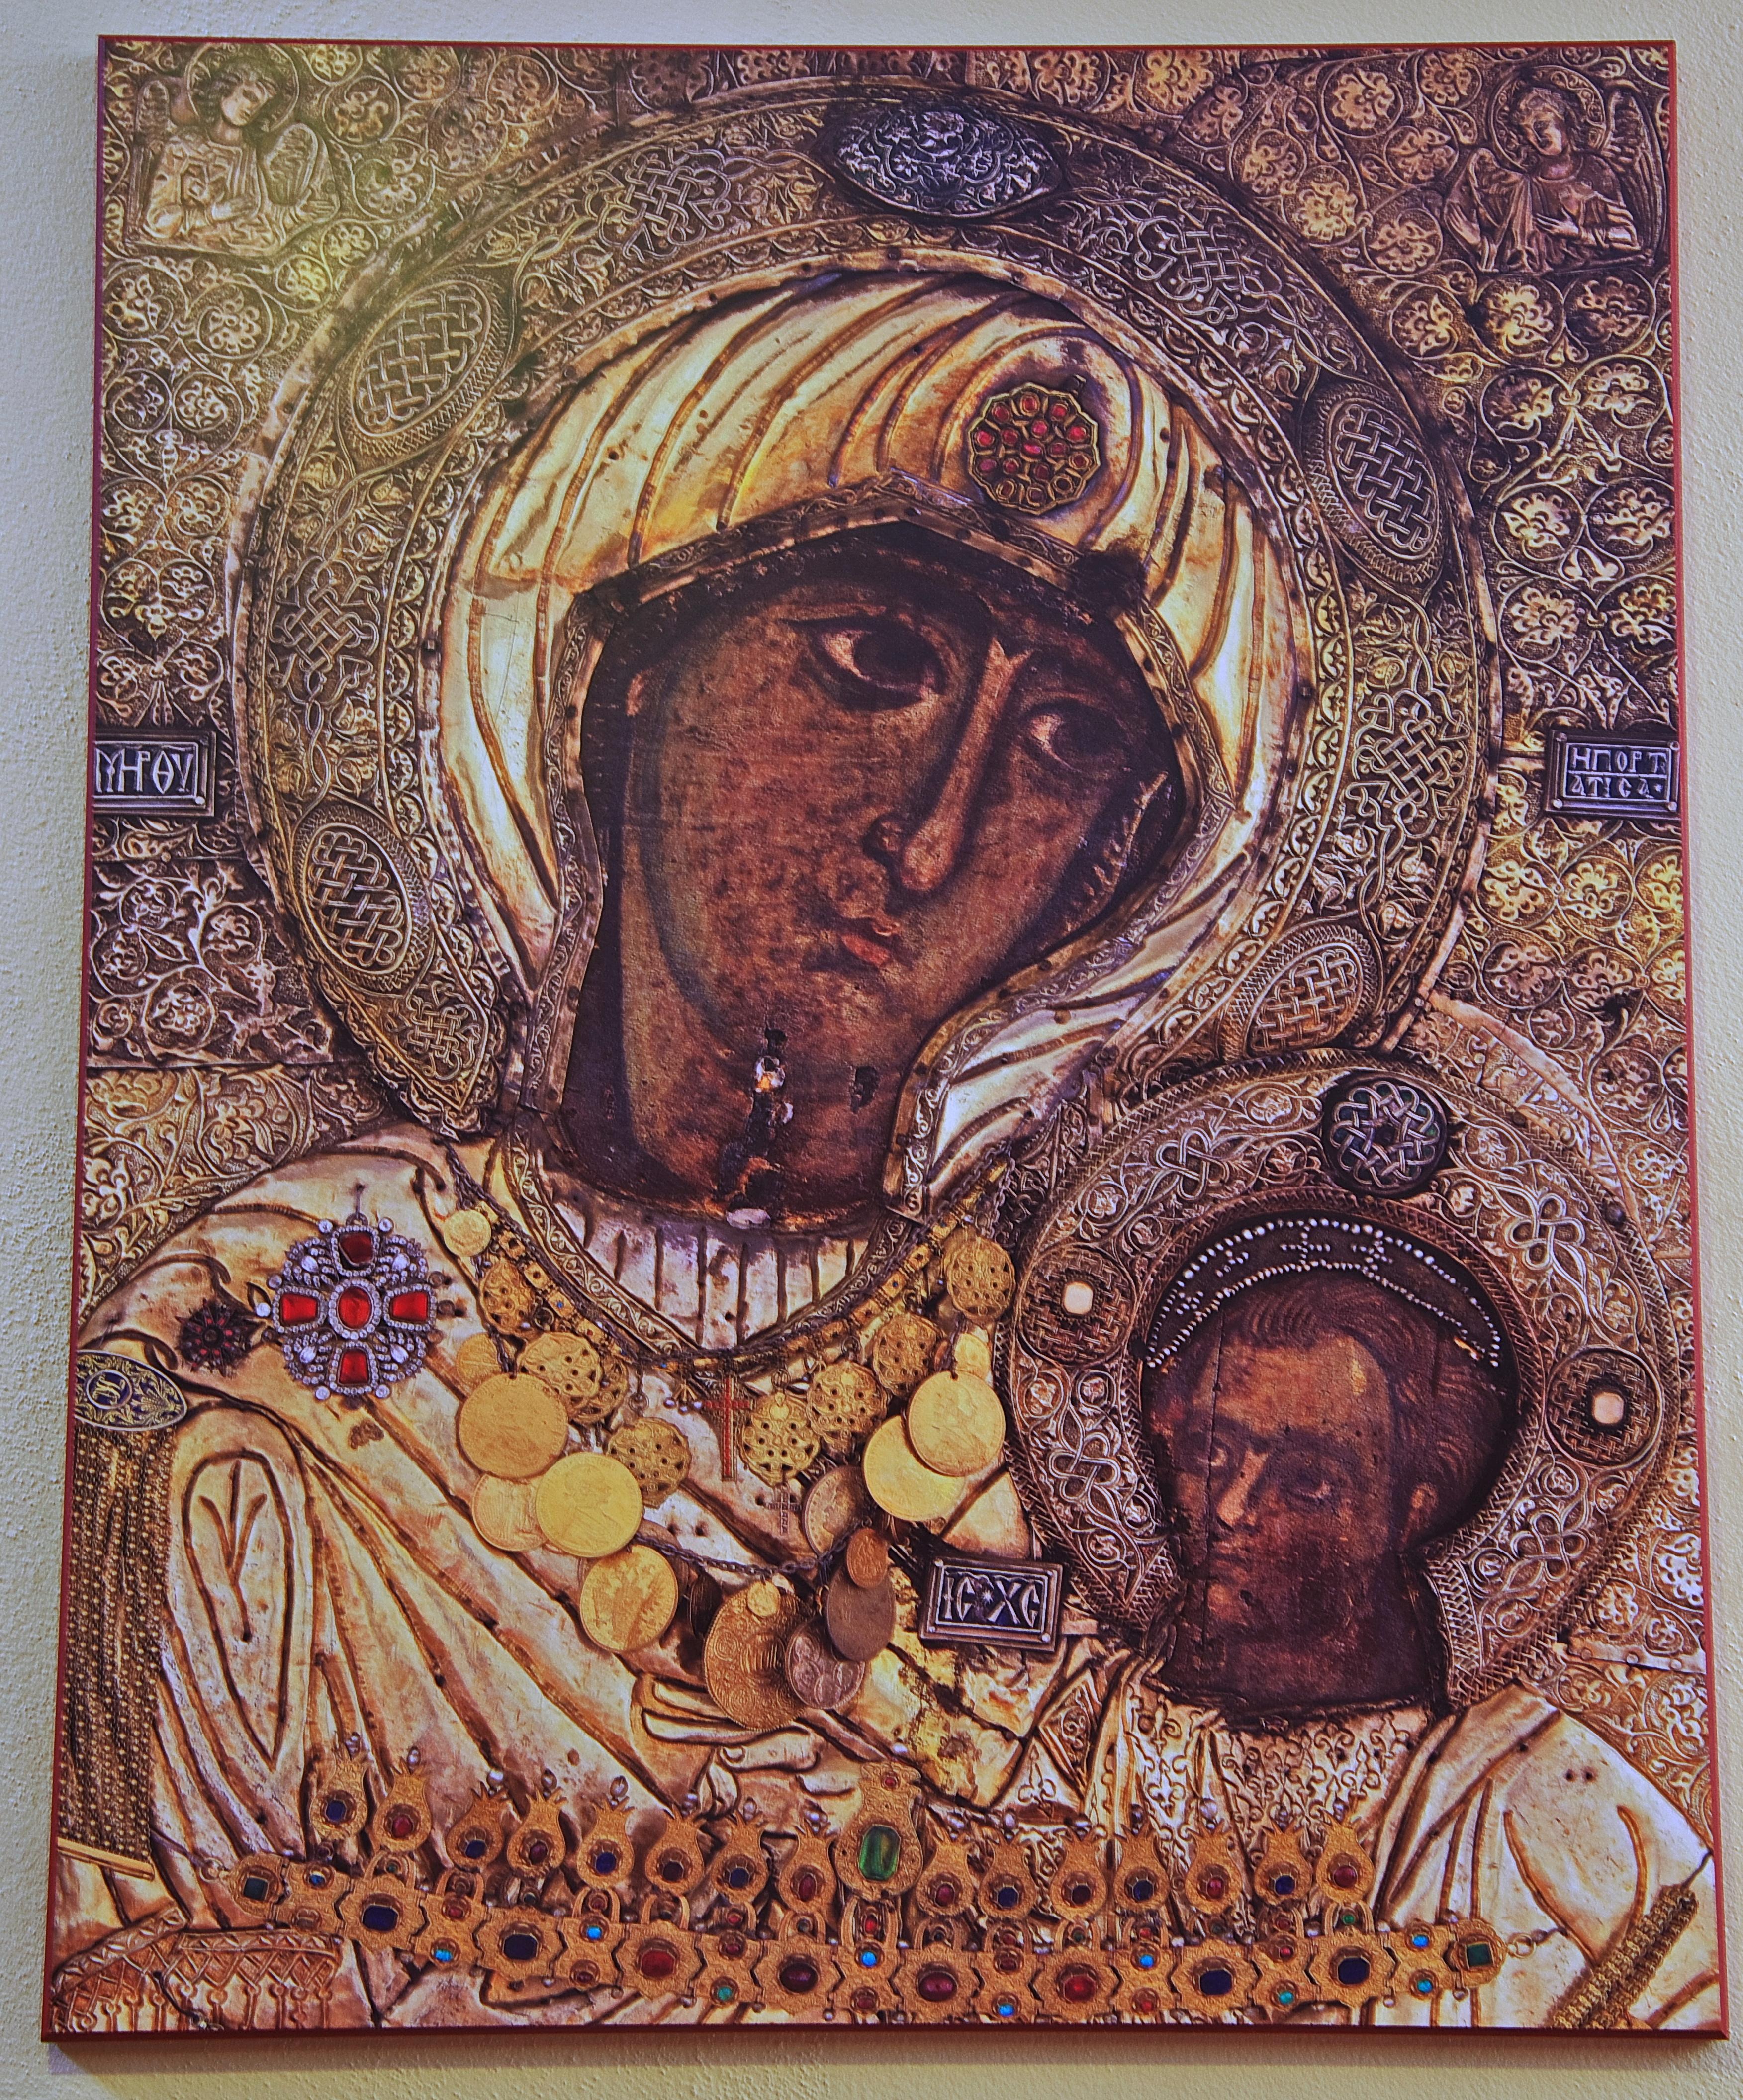 st herman u0026 39 s orthodox church